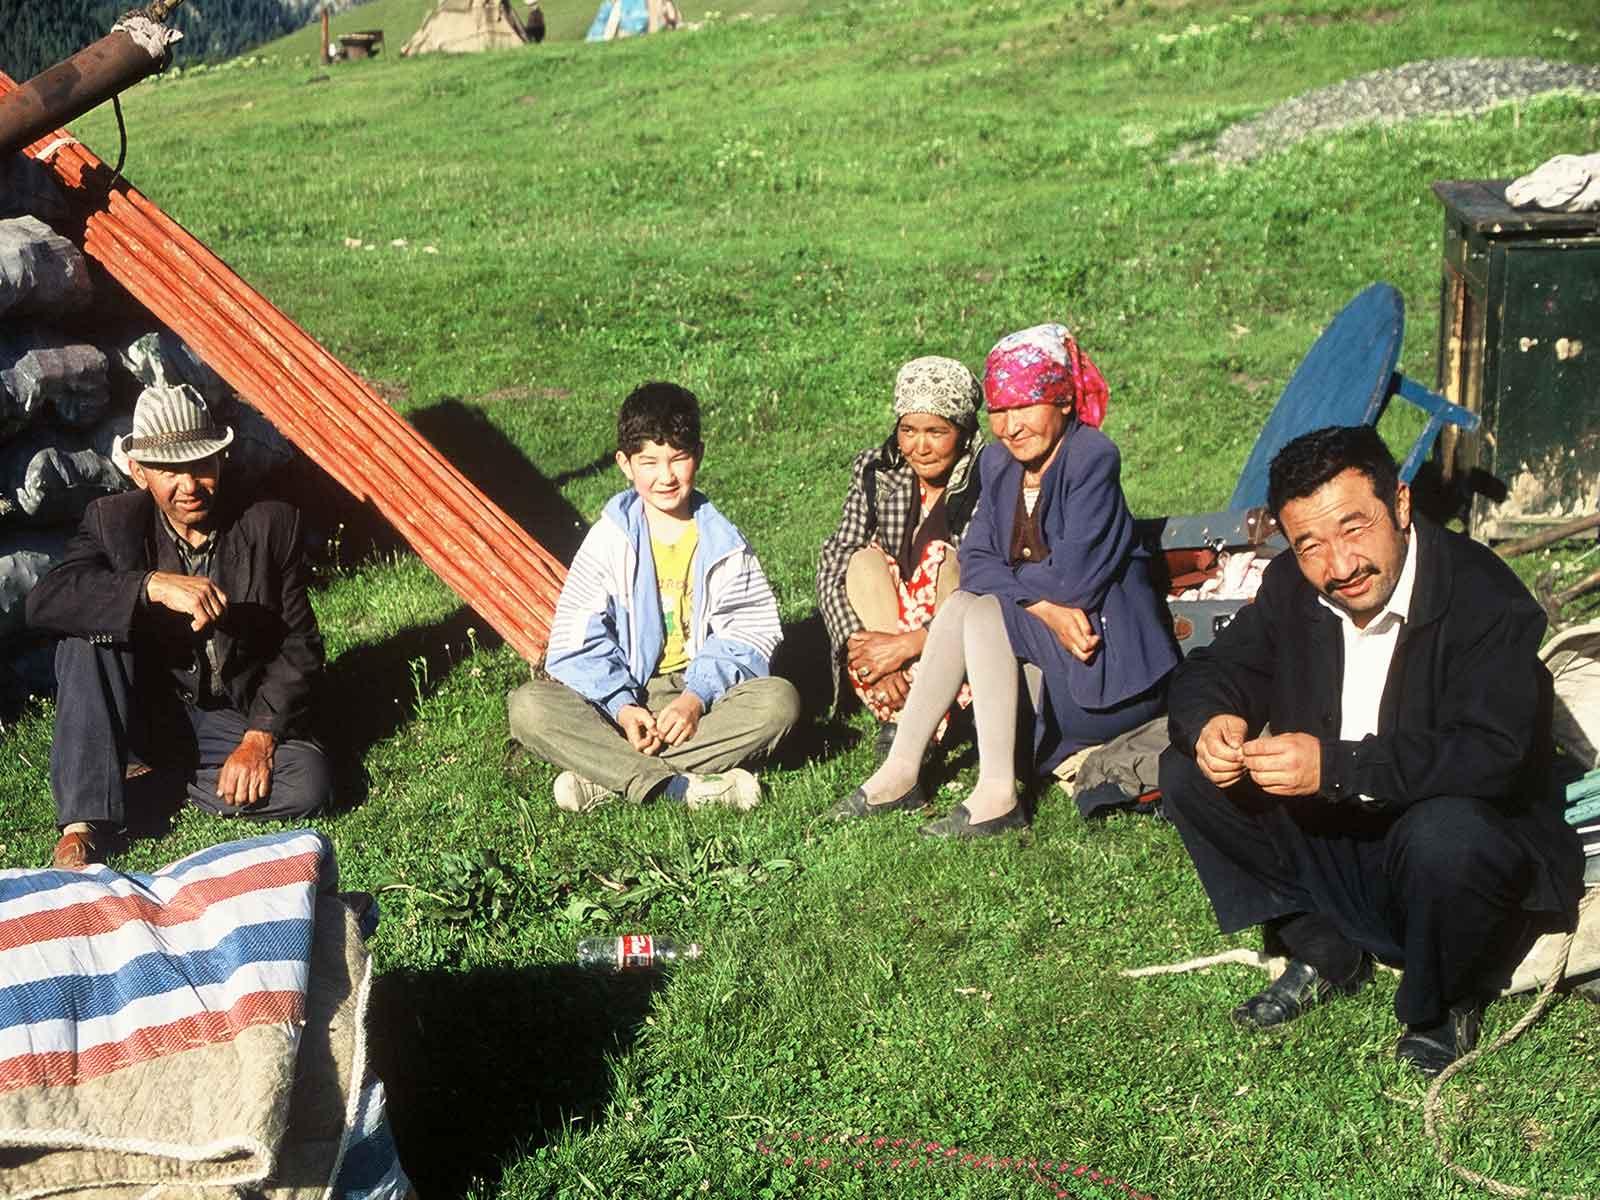 Kazakh family - Yurt - lower pastures Tianshan - Heavenly Mountains - Xinjiang China - Silk Road Research - Dr Steven Andrew Martin - Photo Journal